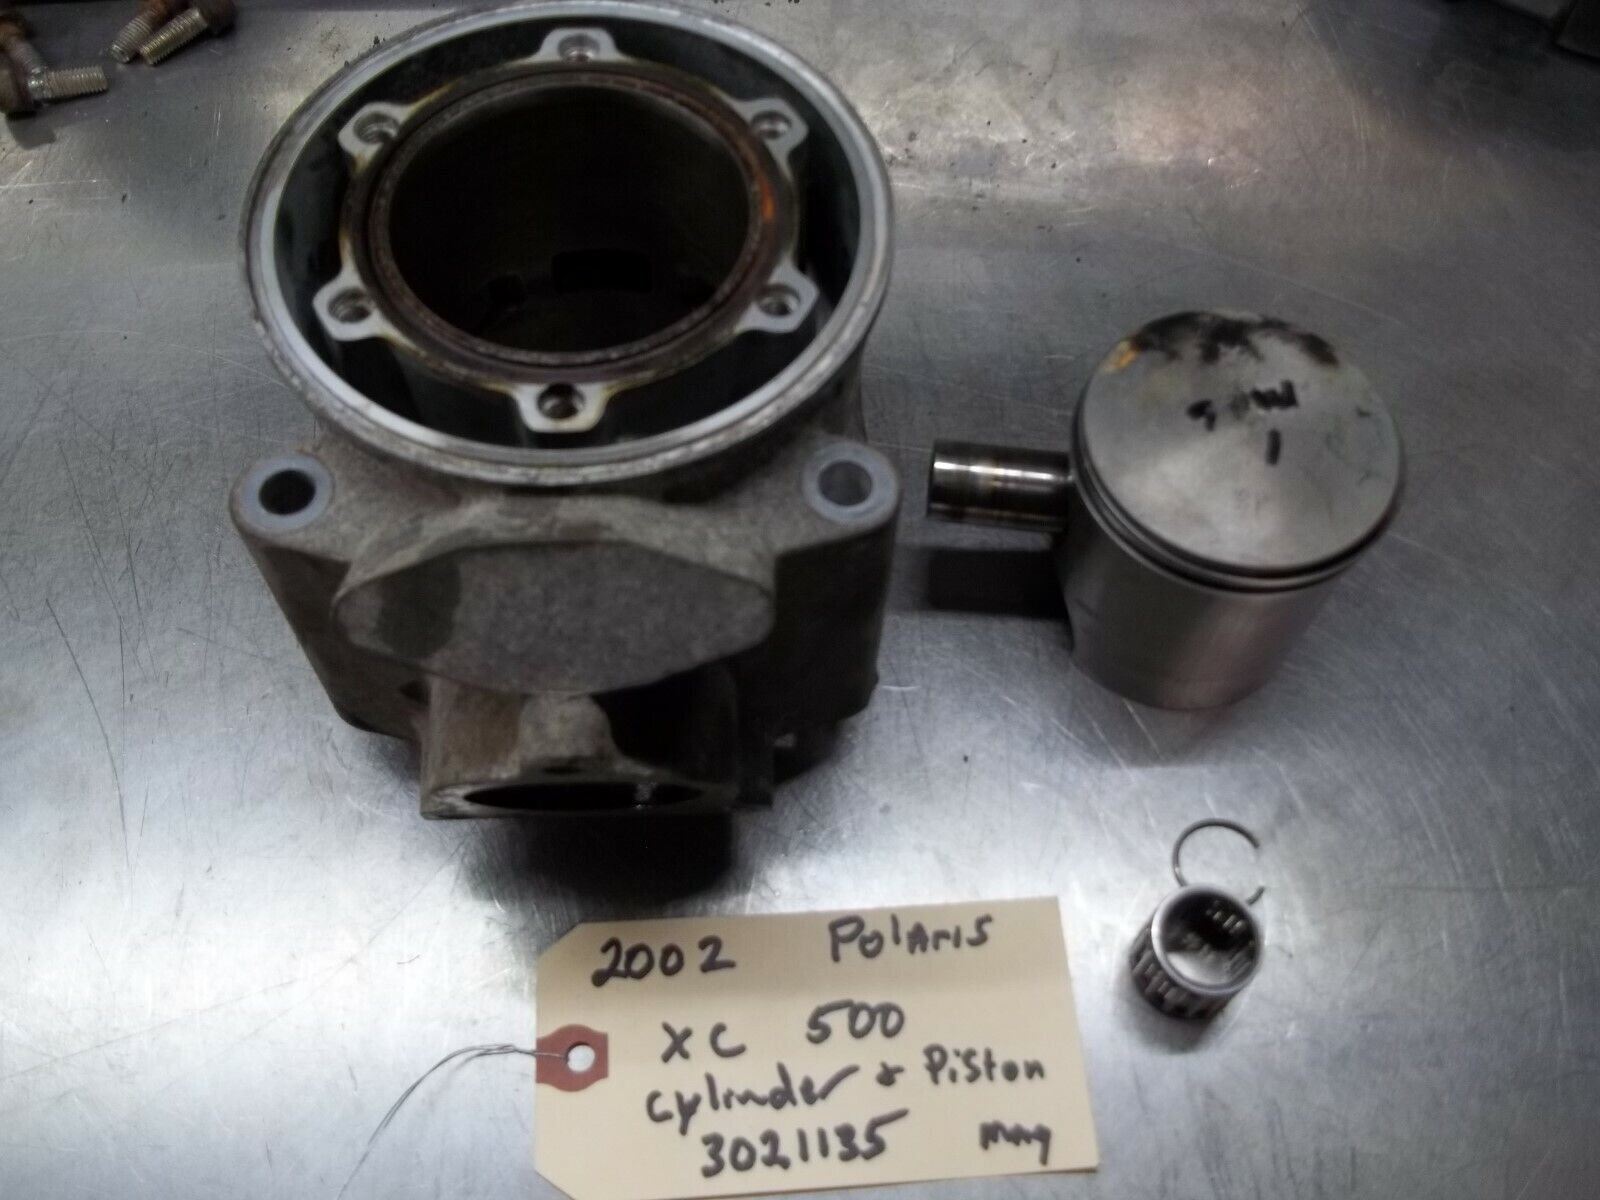 Polaris XC 500 Cylinder & Piston mag (2003)